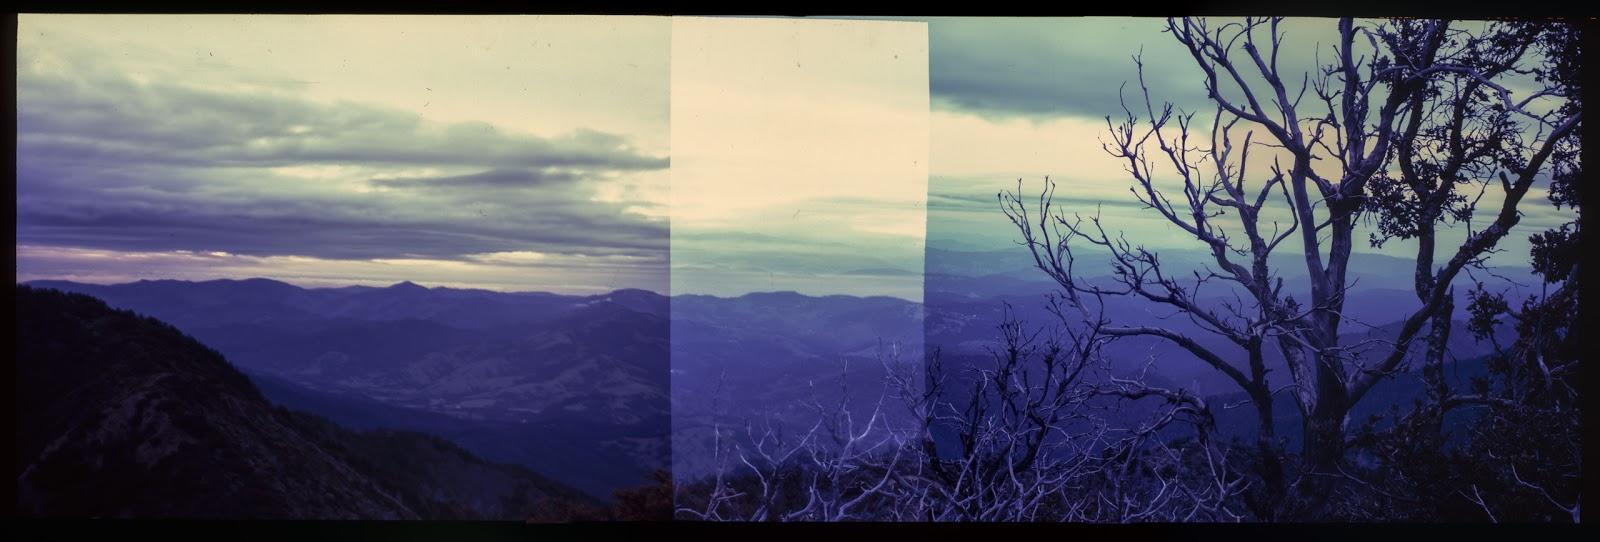 In-camera panorama, Lost Coast, California